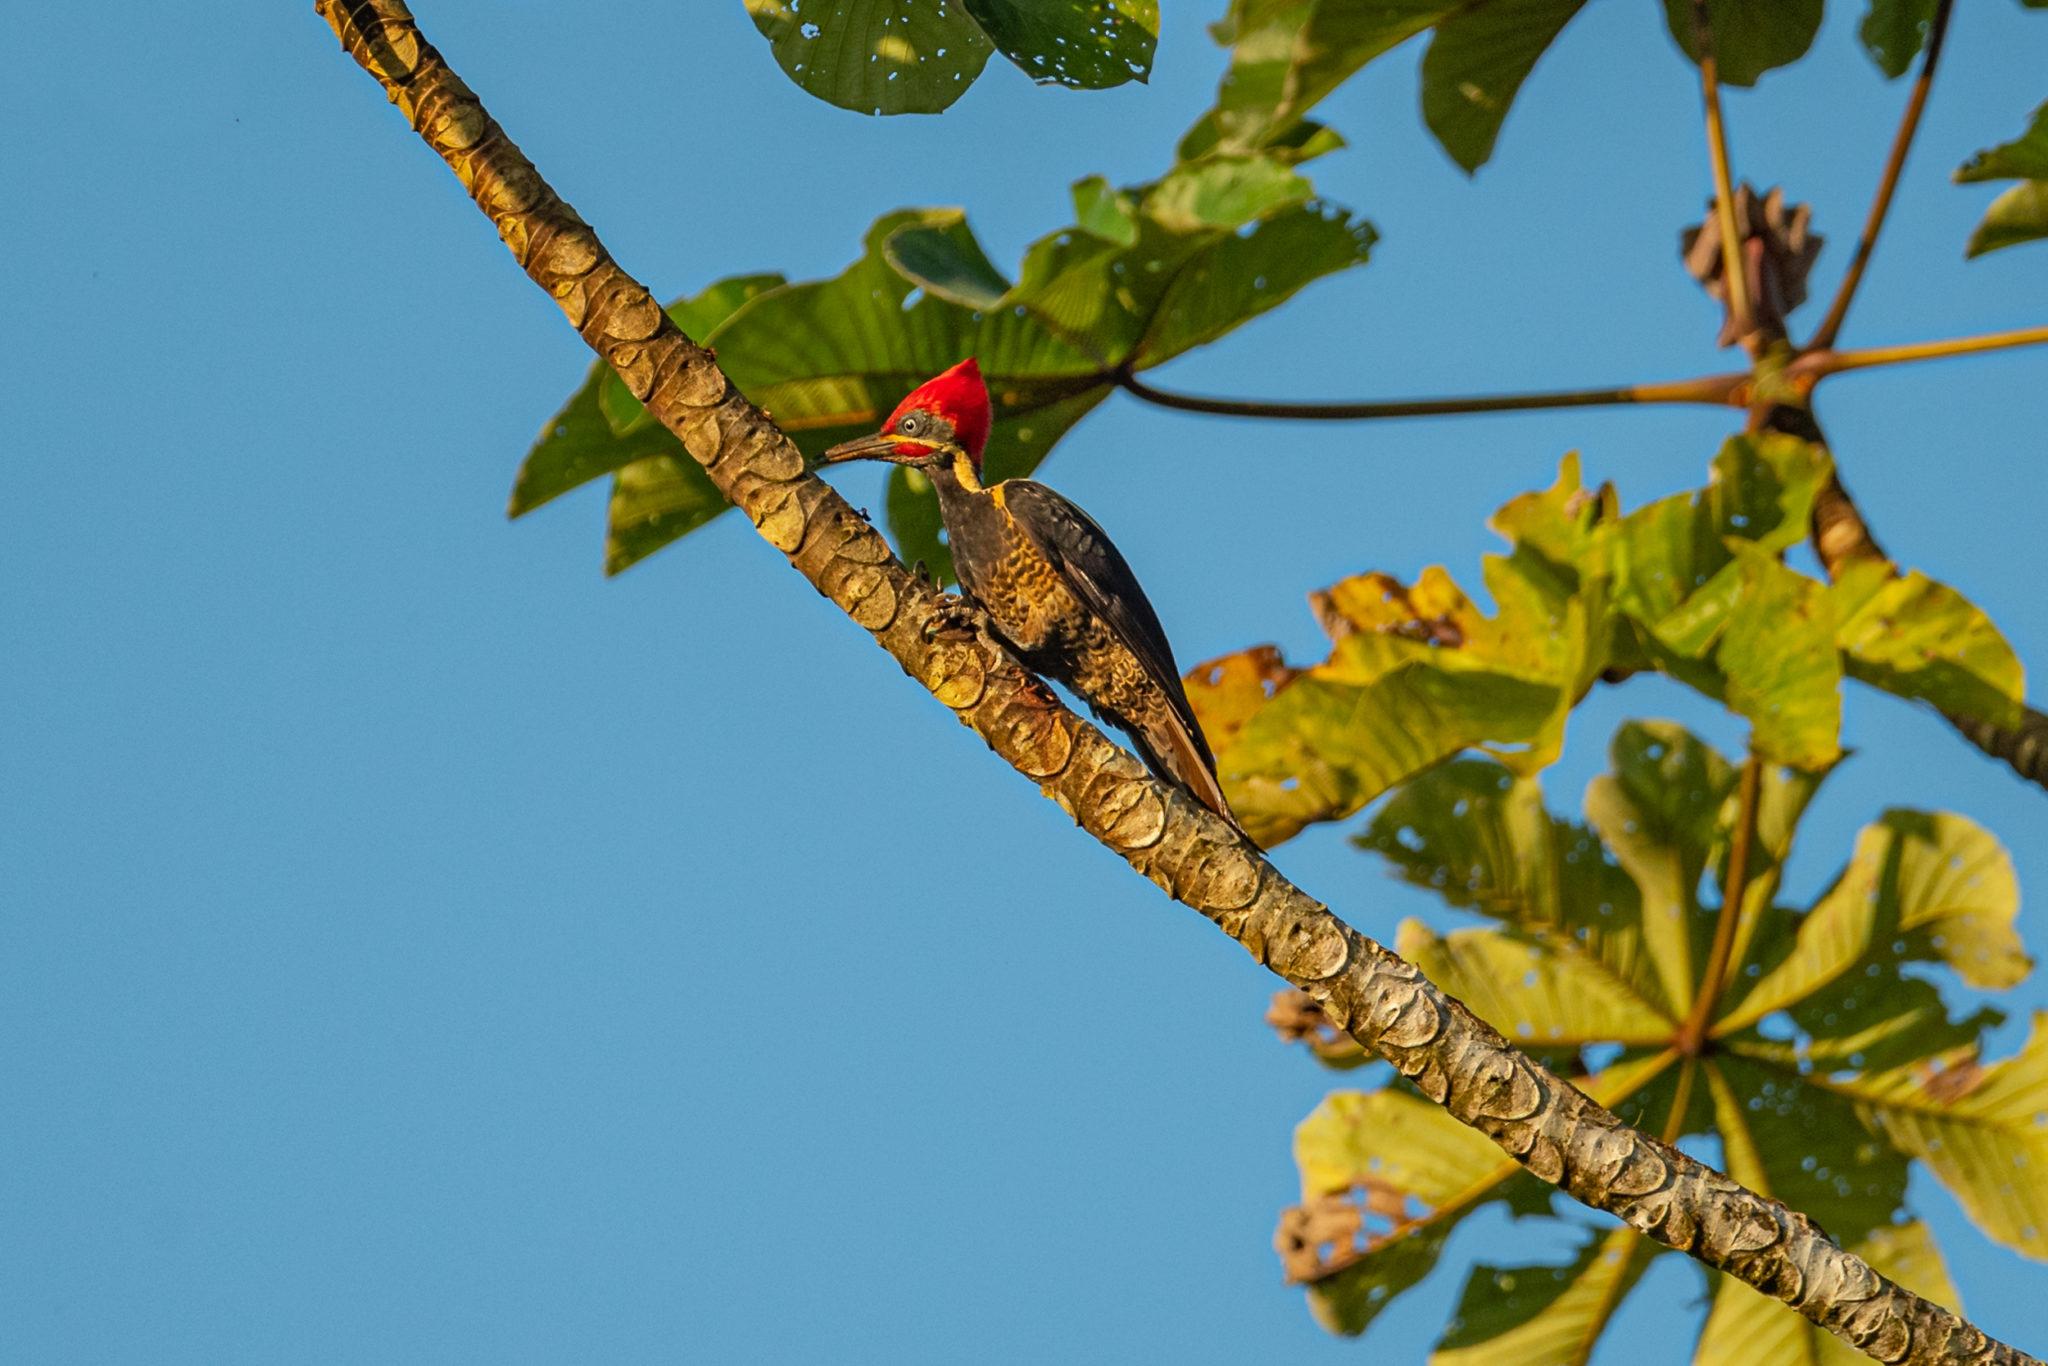 Linienspecht männlich (Dryocopus lineatus) am Rio San Carlos, Naturfotografie Olaf & Sylvia Rentzsch